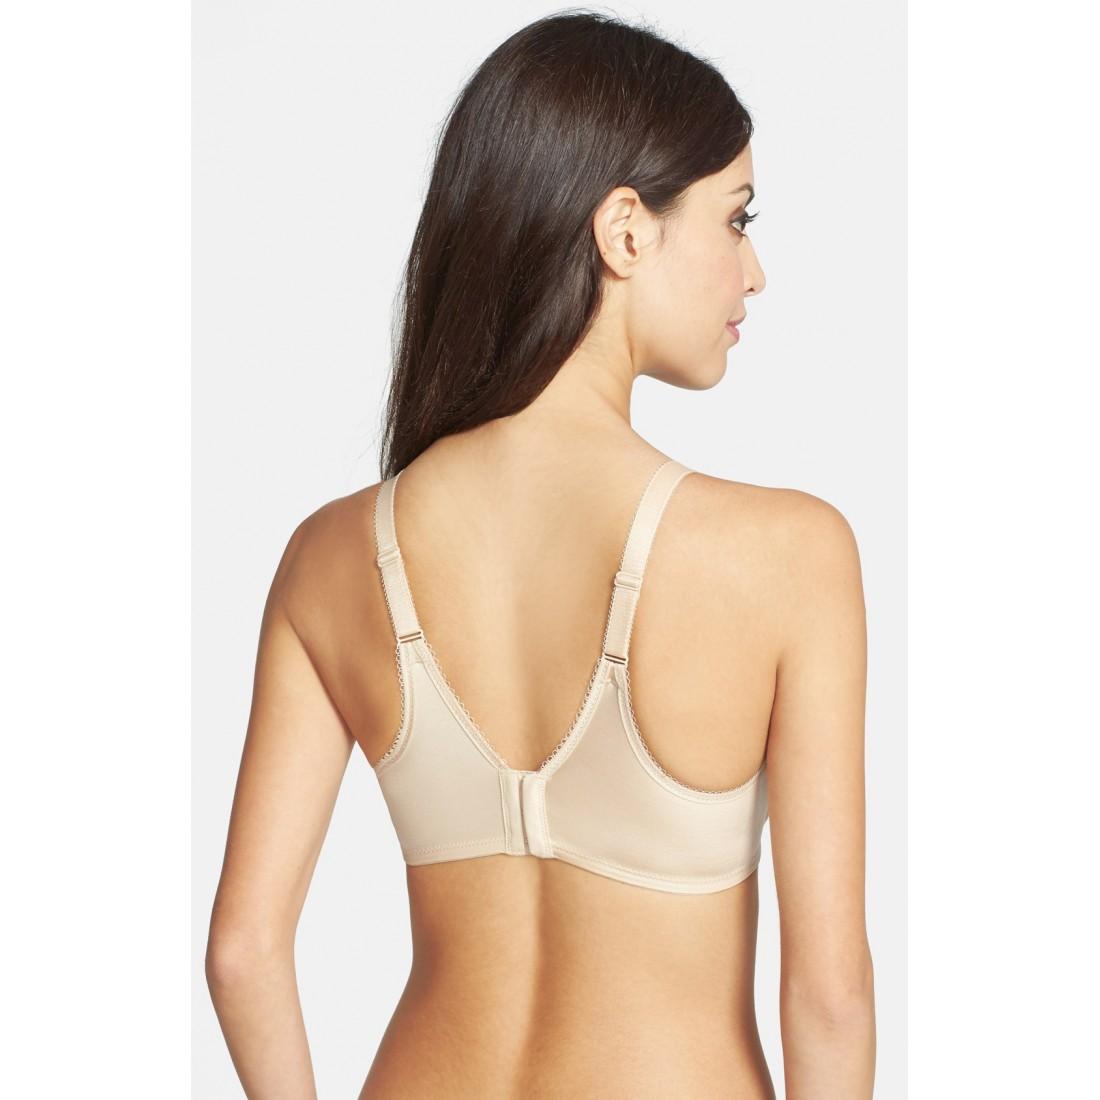 33f6eceffa Wacoal Basic Beauty 855192 Full Figure Underwire Bra NS269403